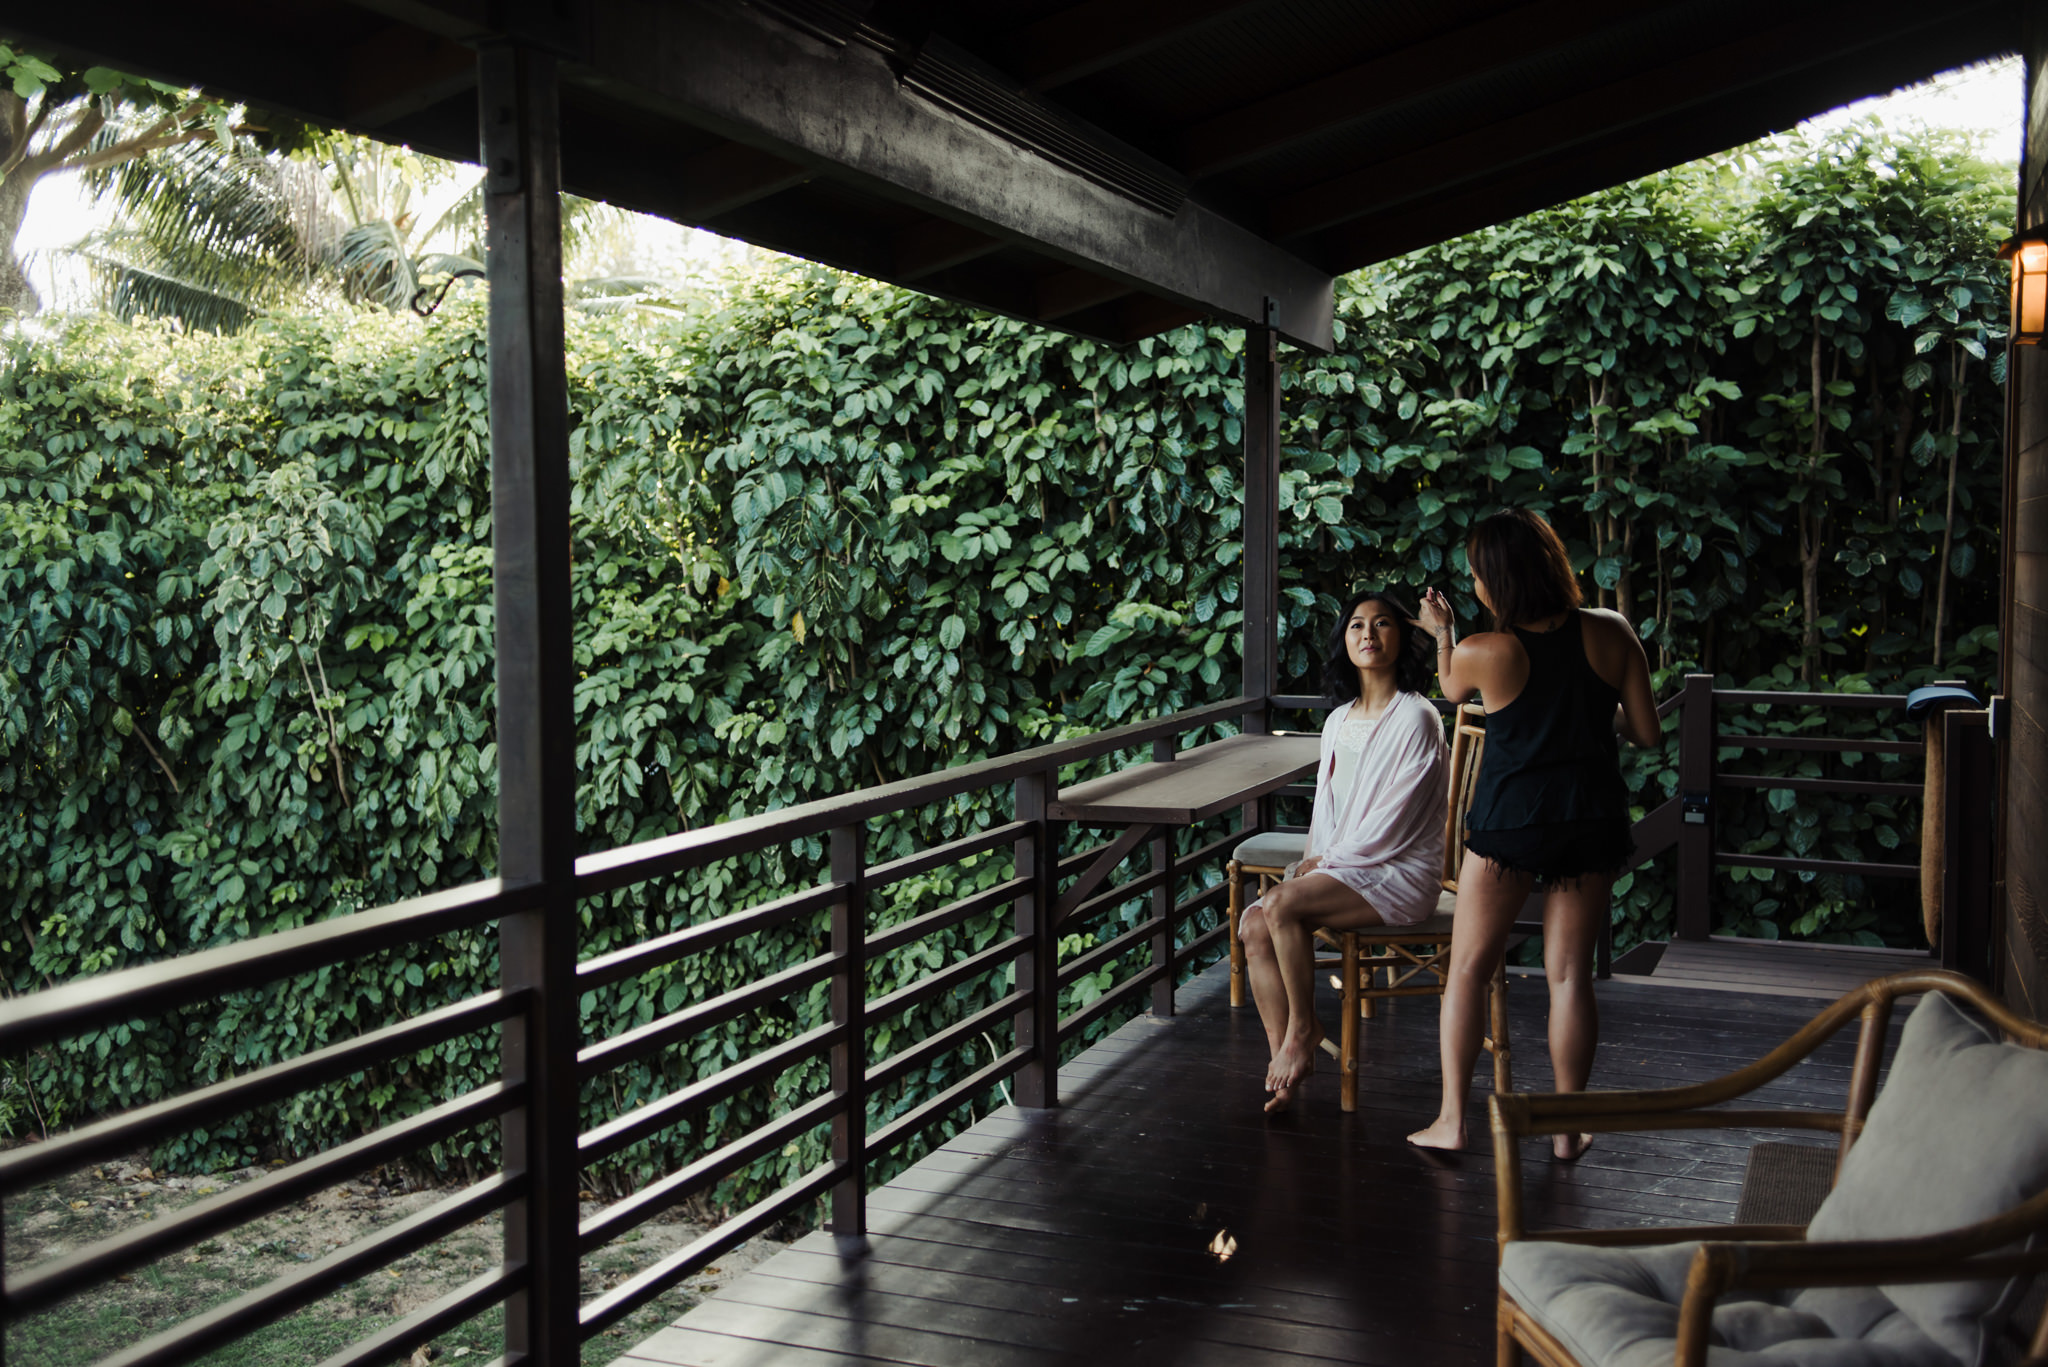 Bride getting ready on patio in tropical paradise Kauai